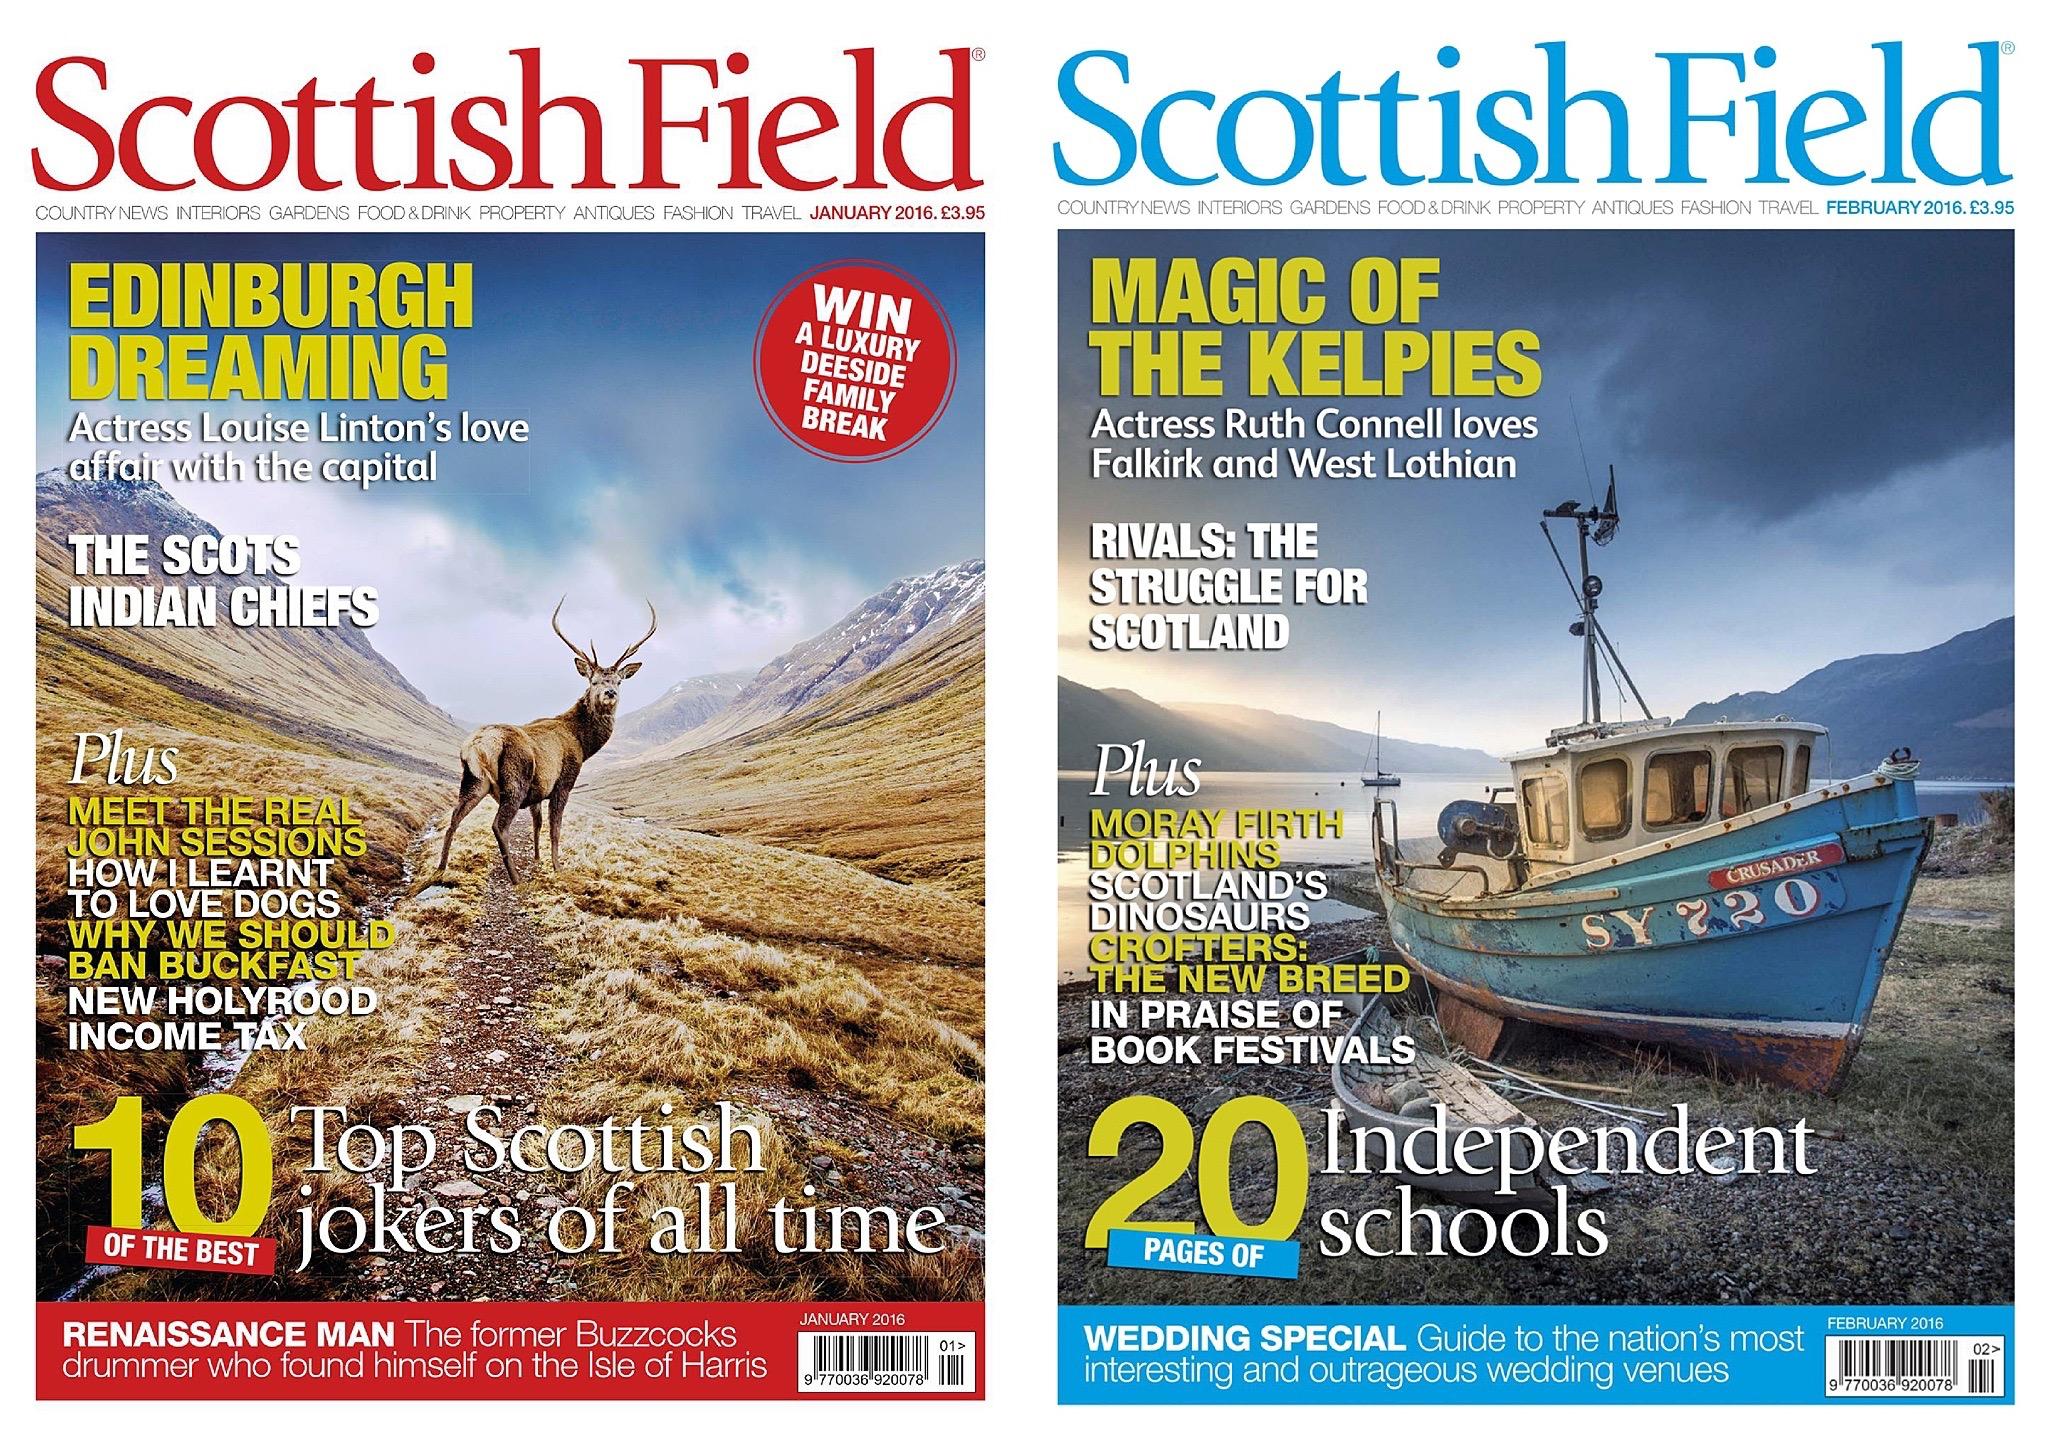 Scottish Field - Publication - article - dossier - presse